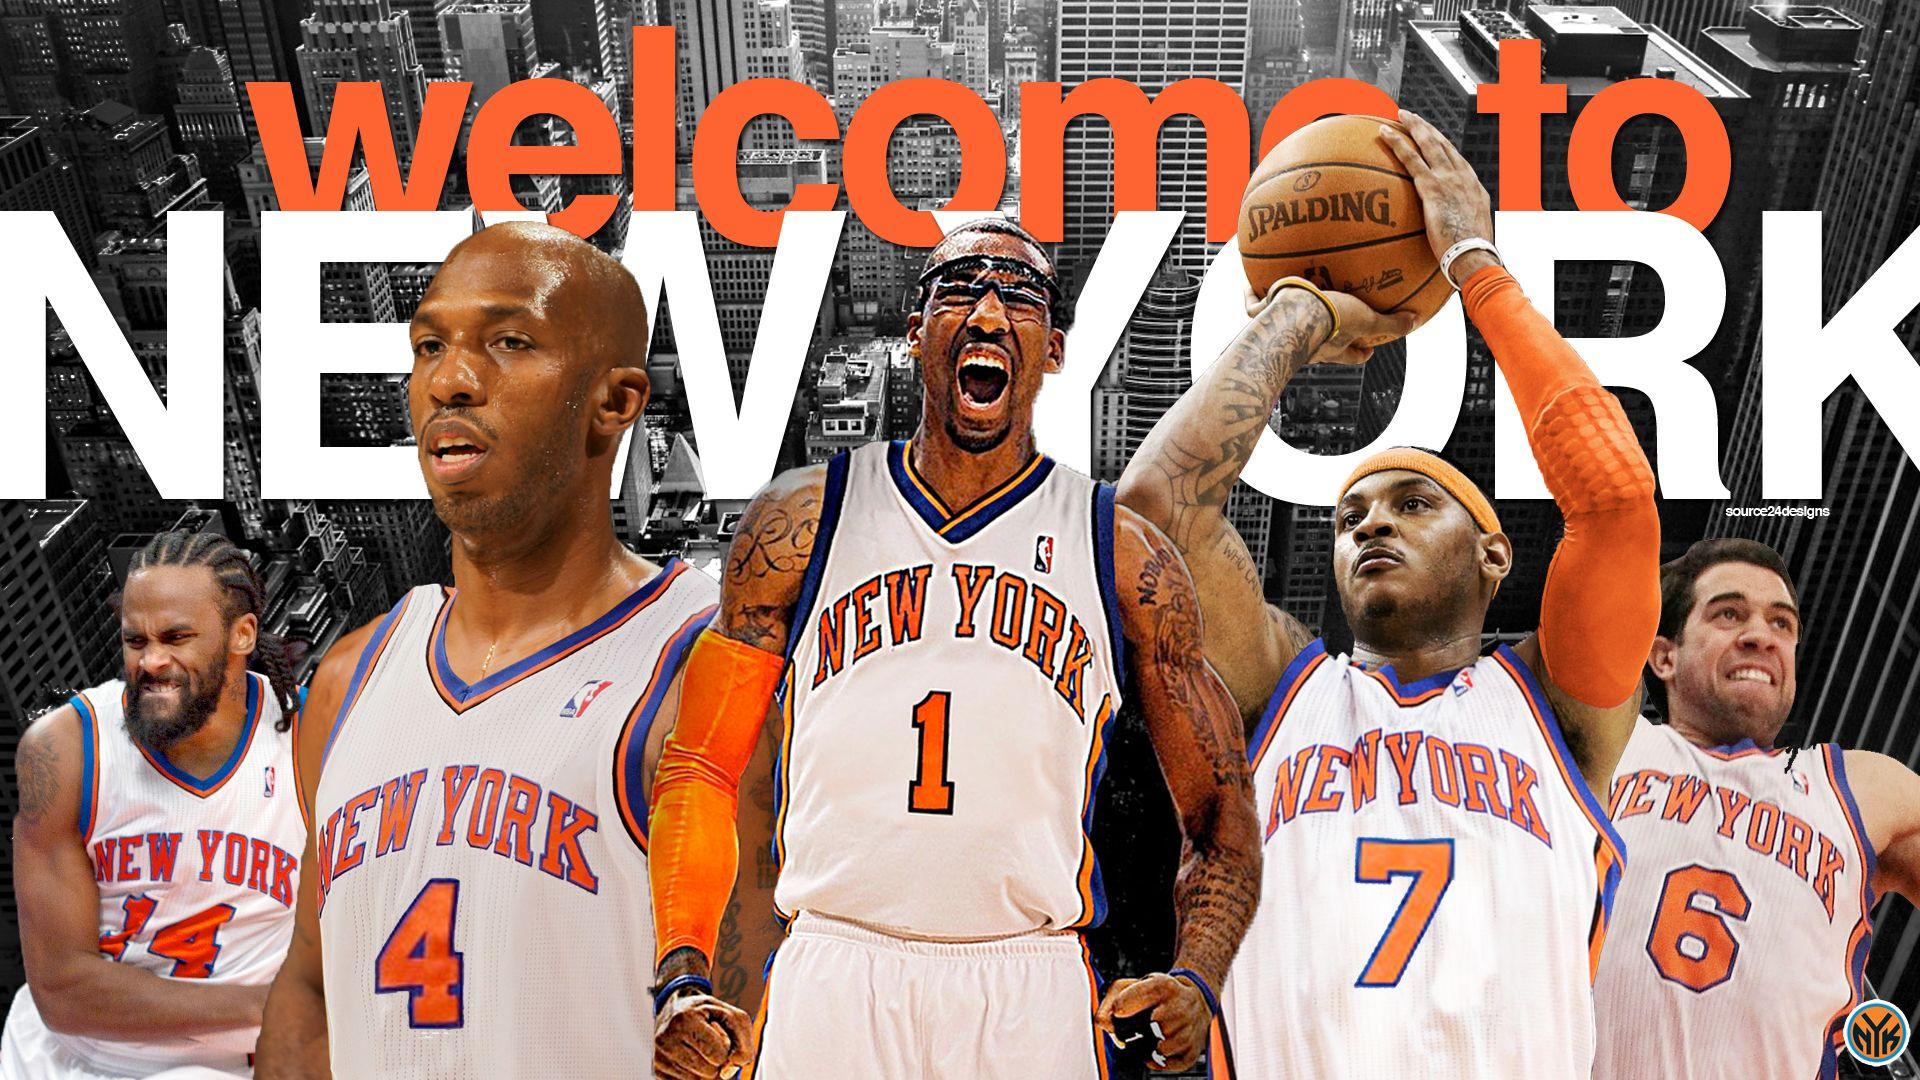 Nba Basketball New York Knicks: New York Knicks 2012 Team Wallpaper